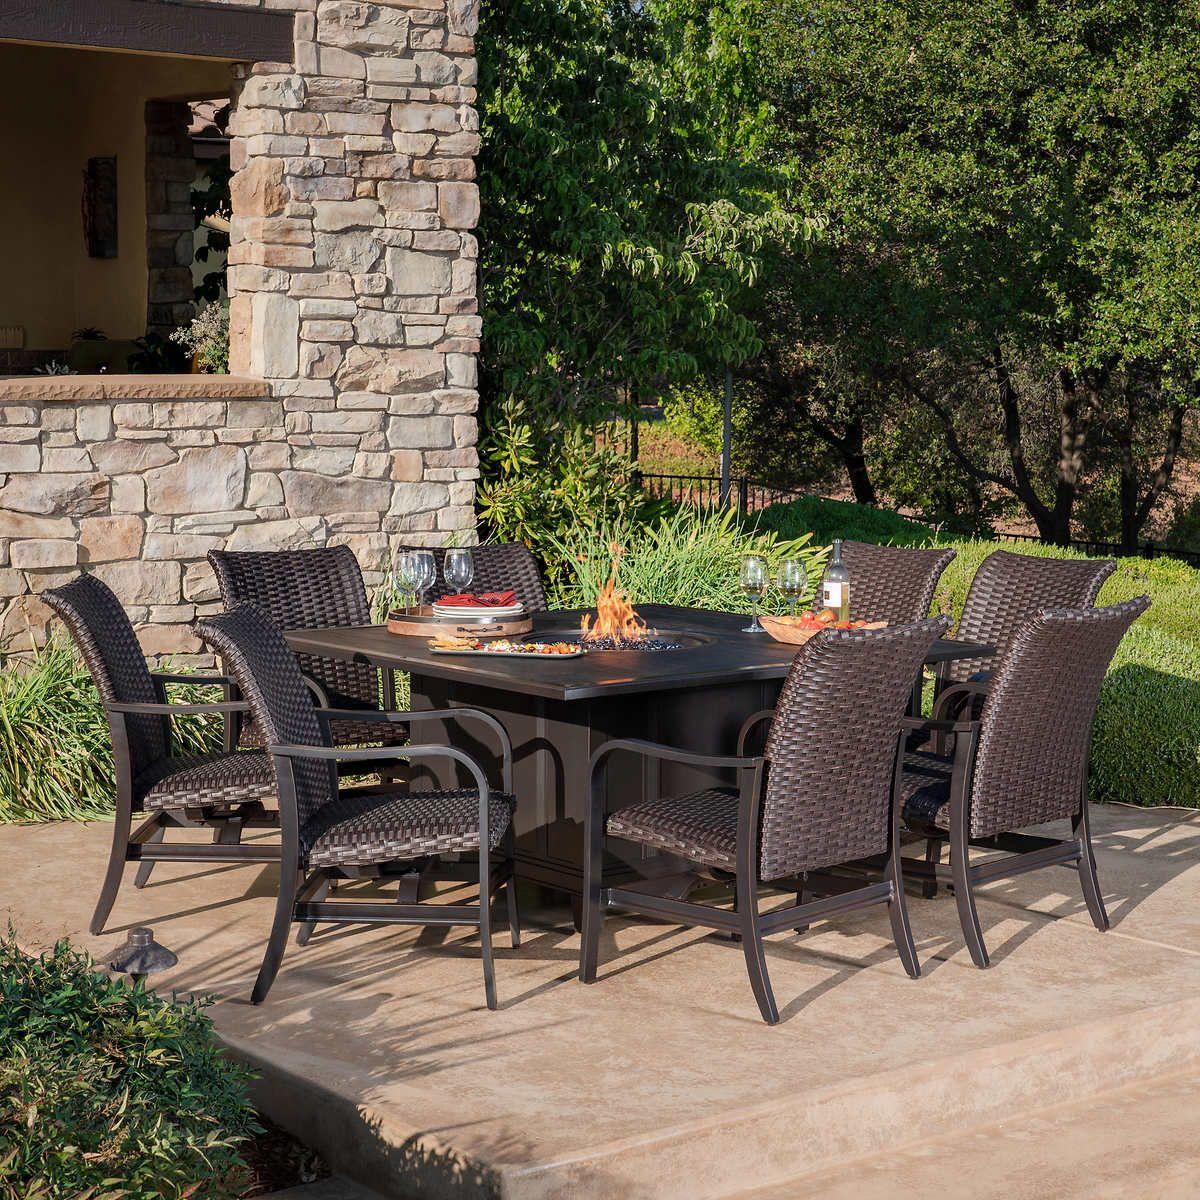 Bellafina 9piece Fire Dining Set in 2020 Diy patio